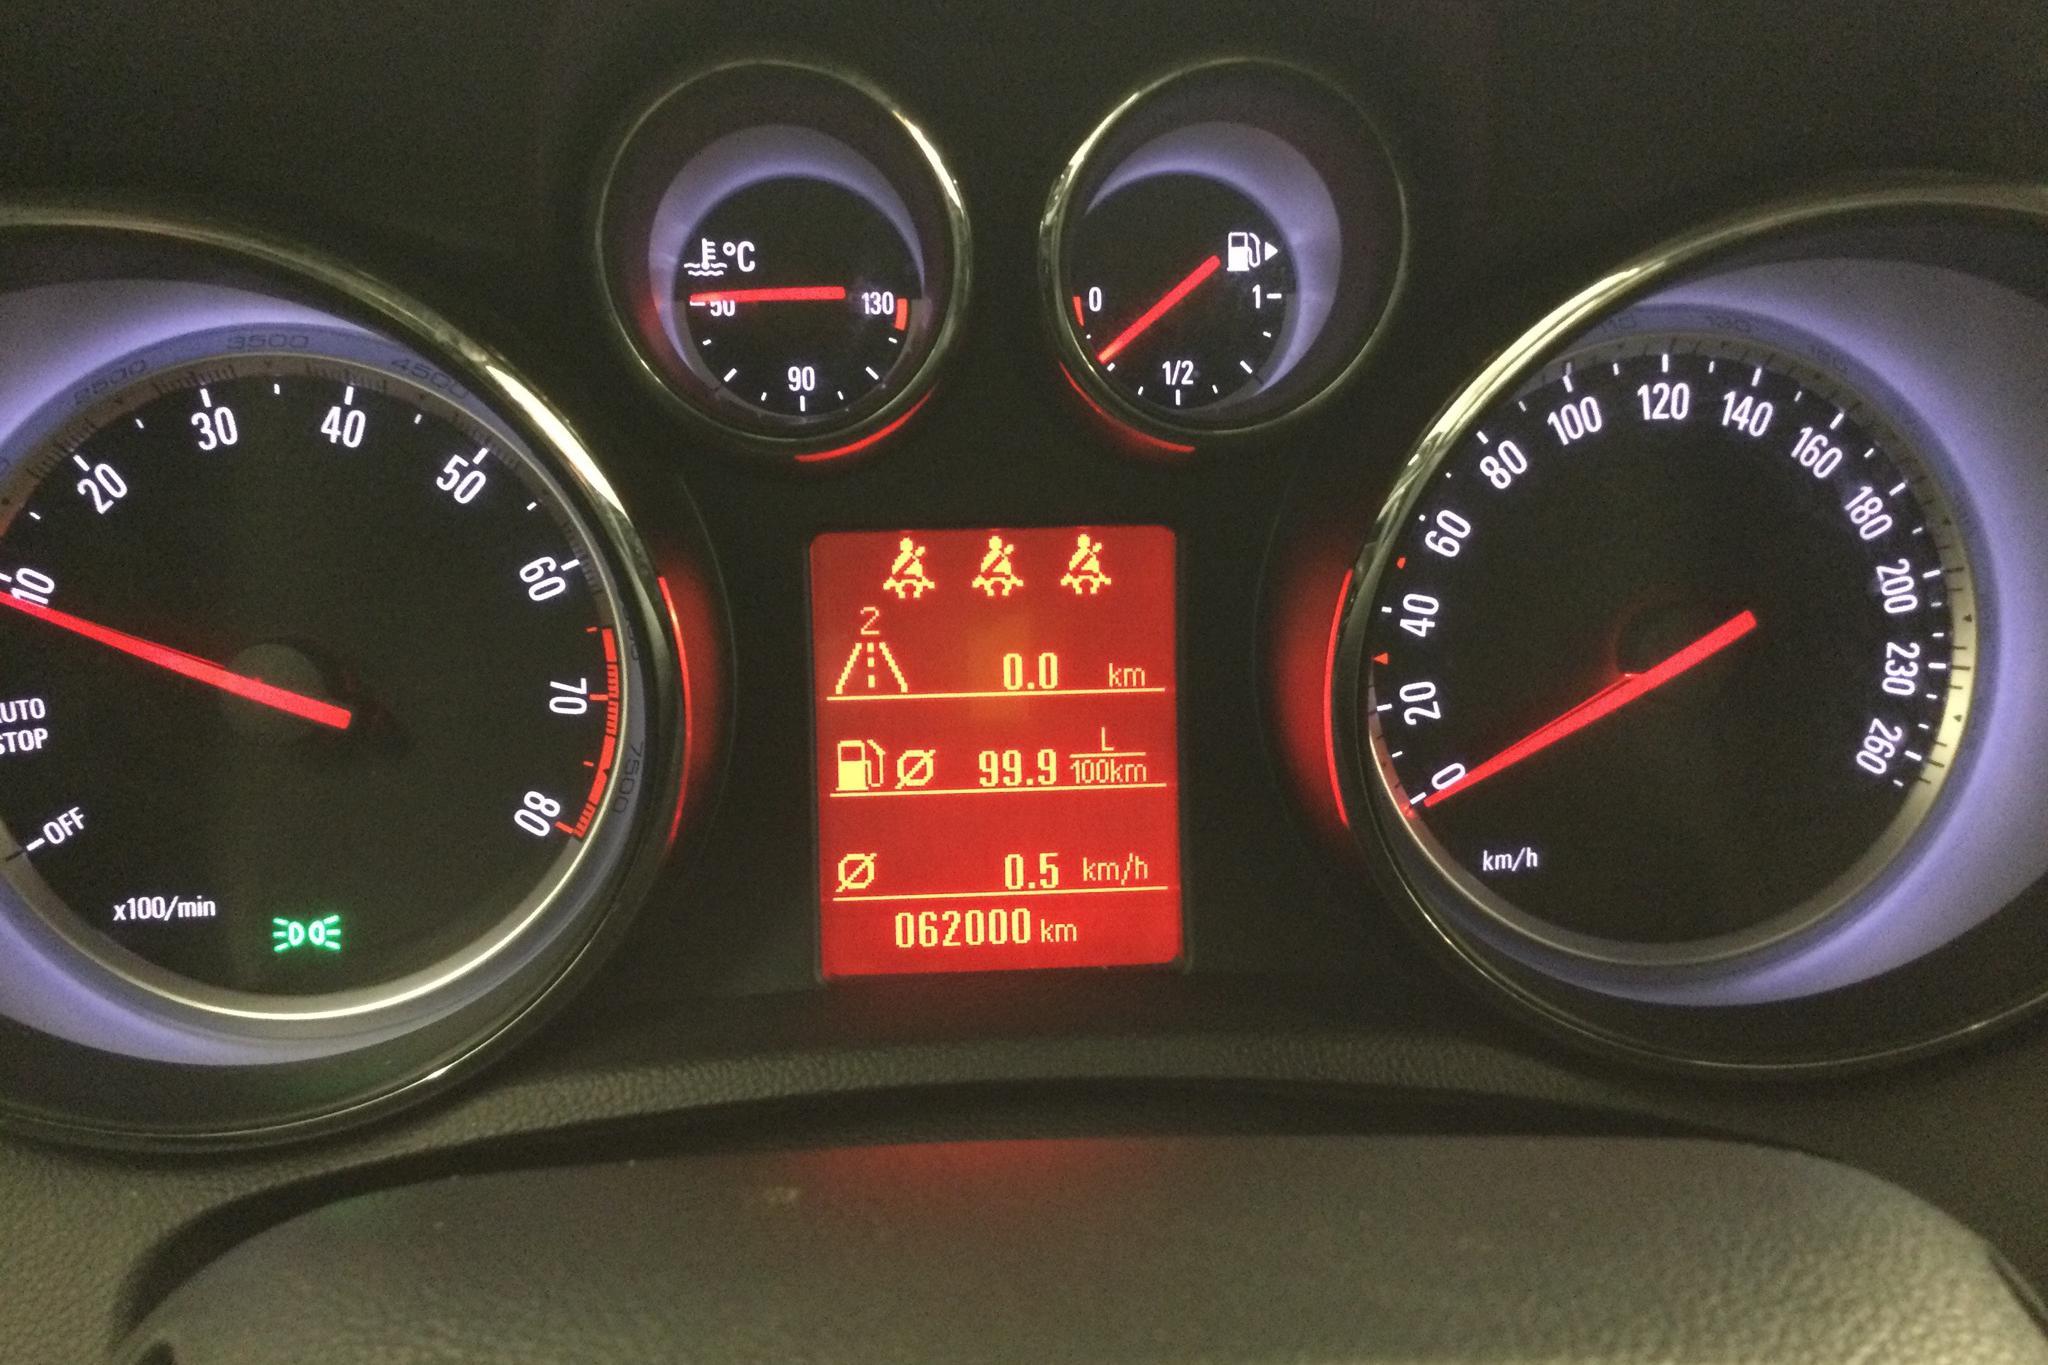 Opel Mokka 1.4 Turbo ECOTEC 4x4 (140hk) - 6 200 mil - Manuell - grå - 2016